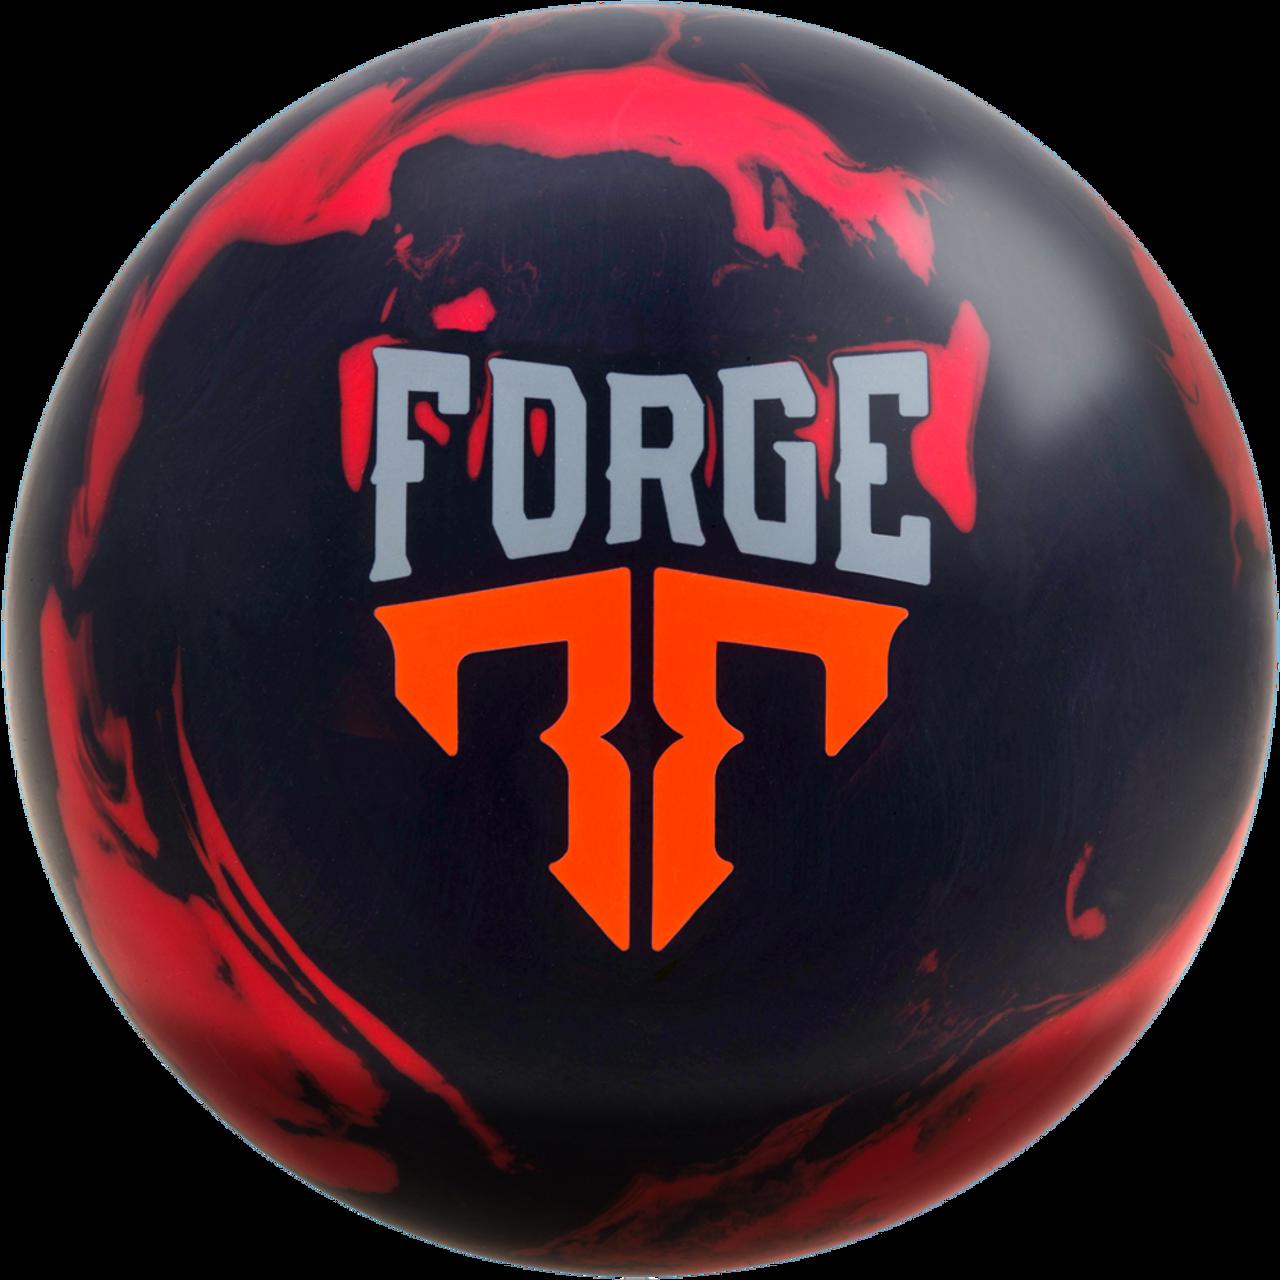 Motiv Forge Bowling Ball